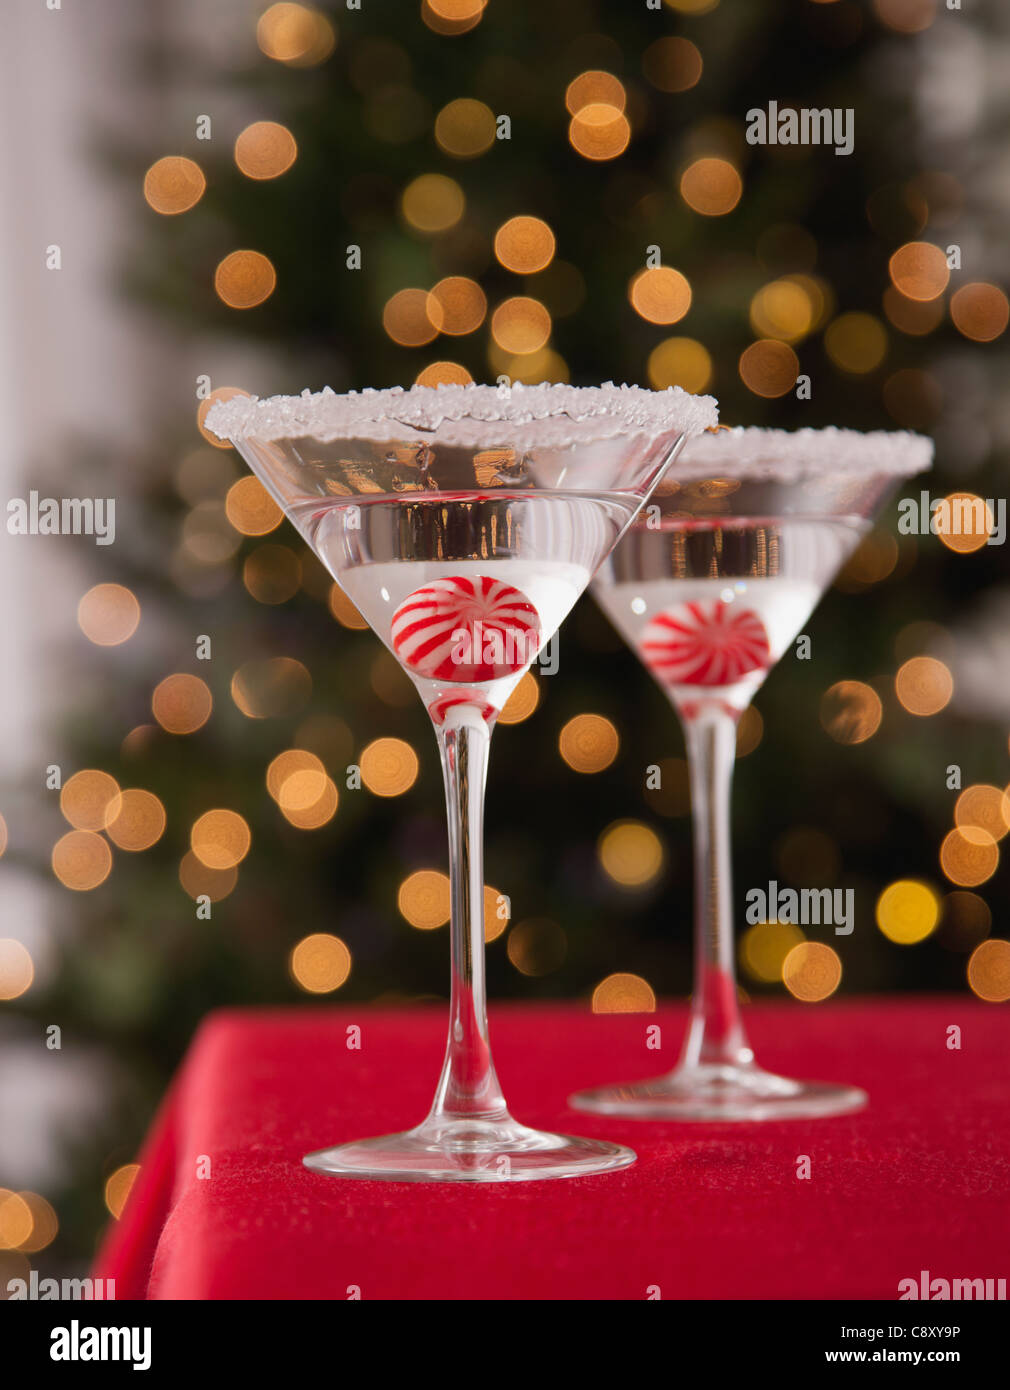 USA, Illinois, Metamora, Martini glasses with candies inside against illuminated Christmas tree - Stock Image